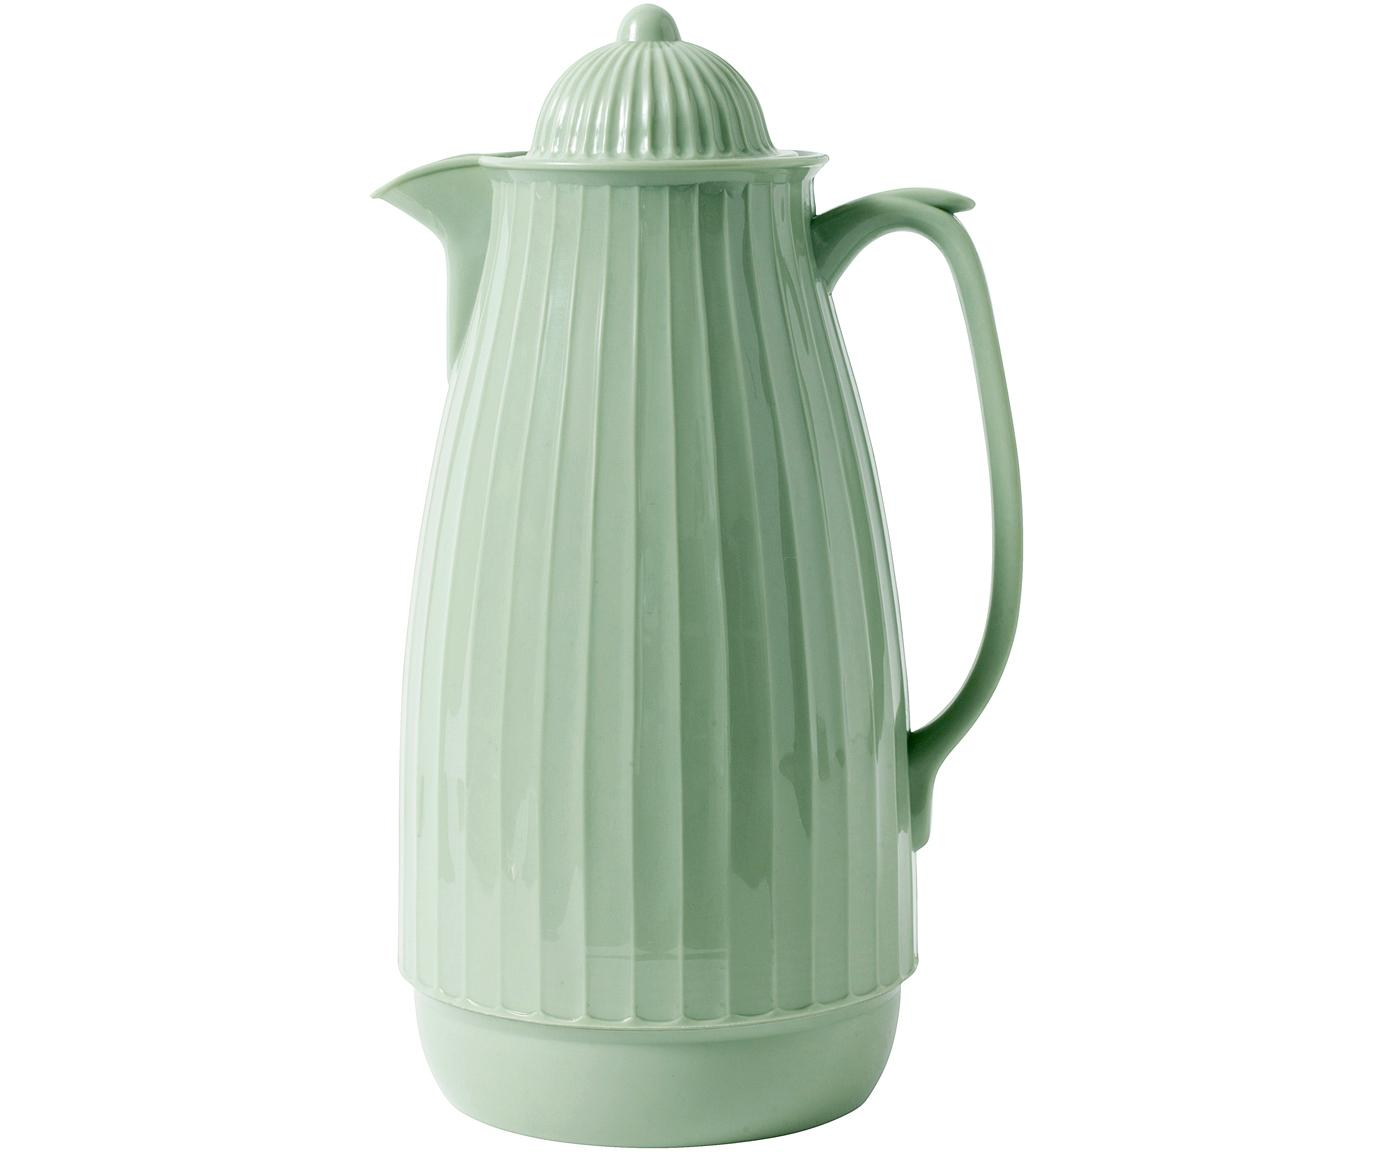 Termos Juggie, Pastelowy zielony, 1 l